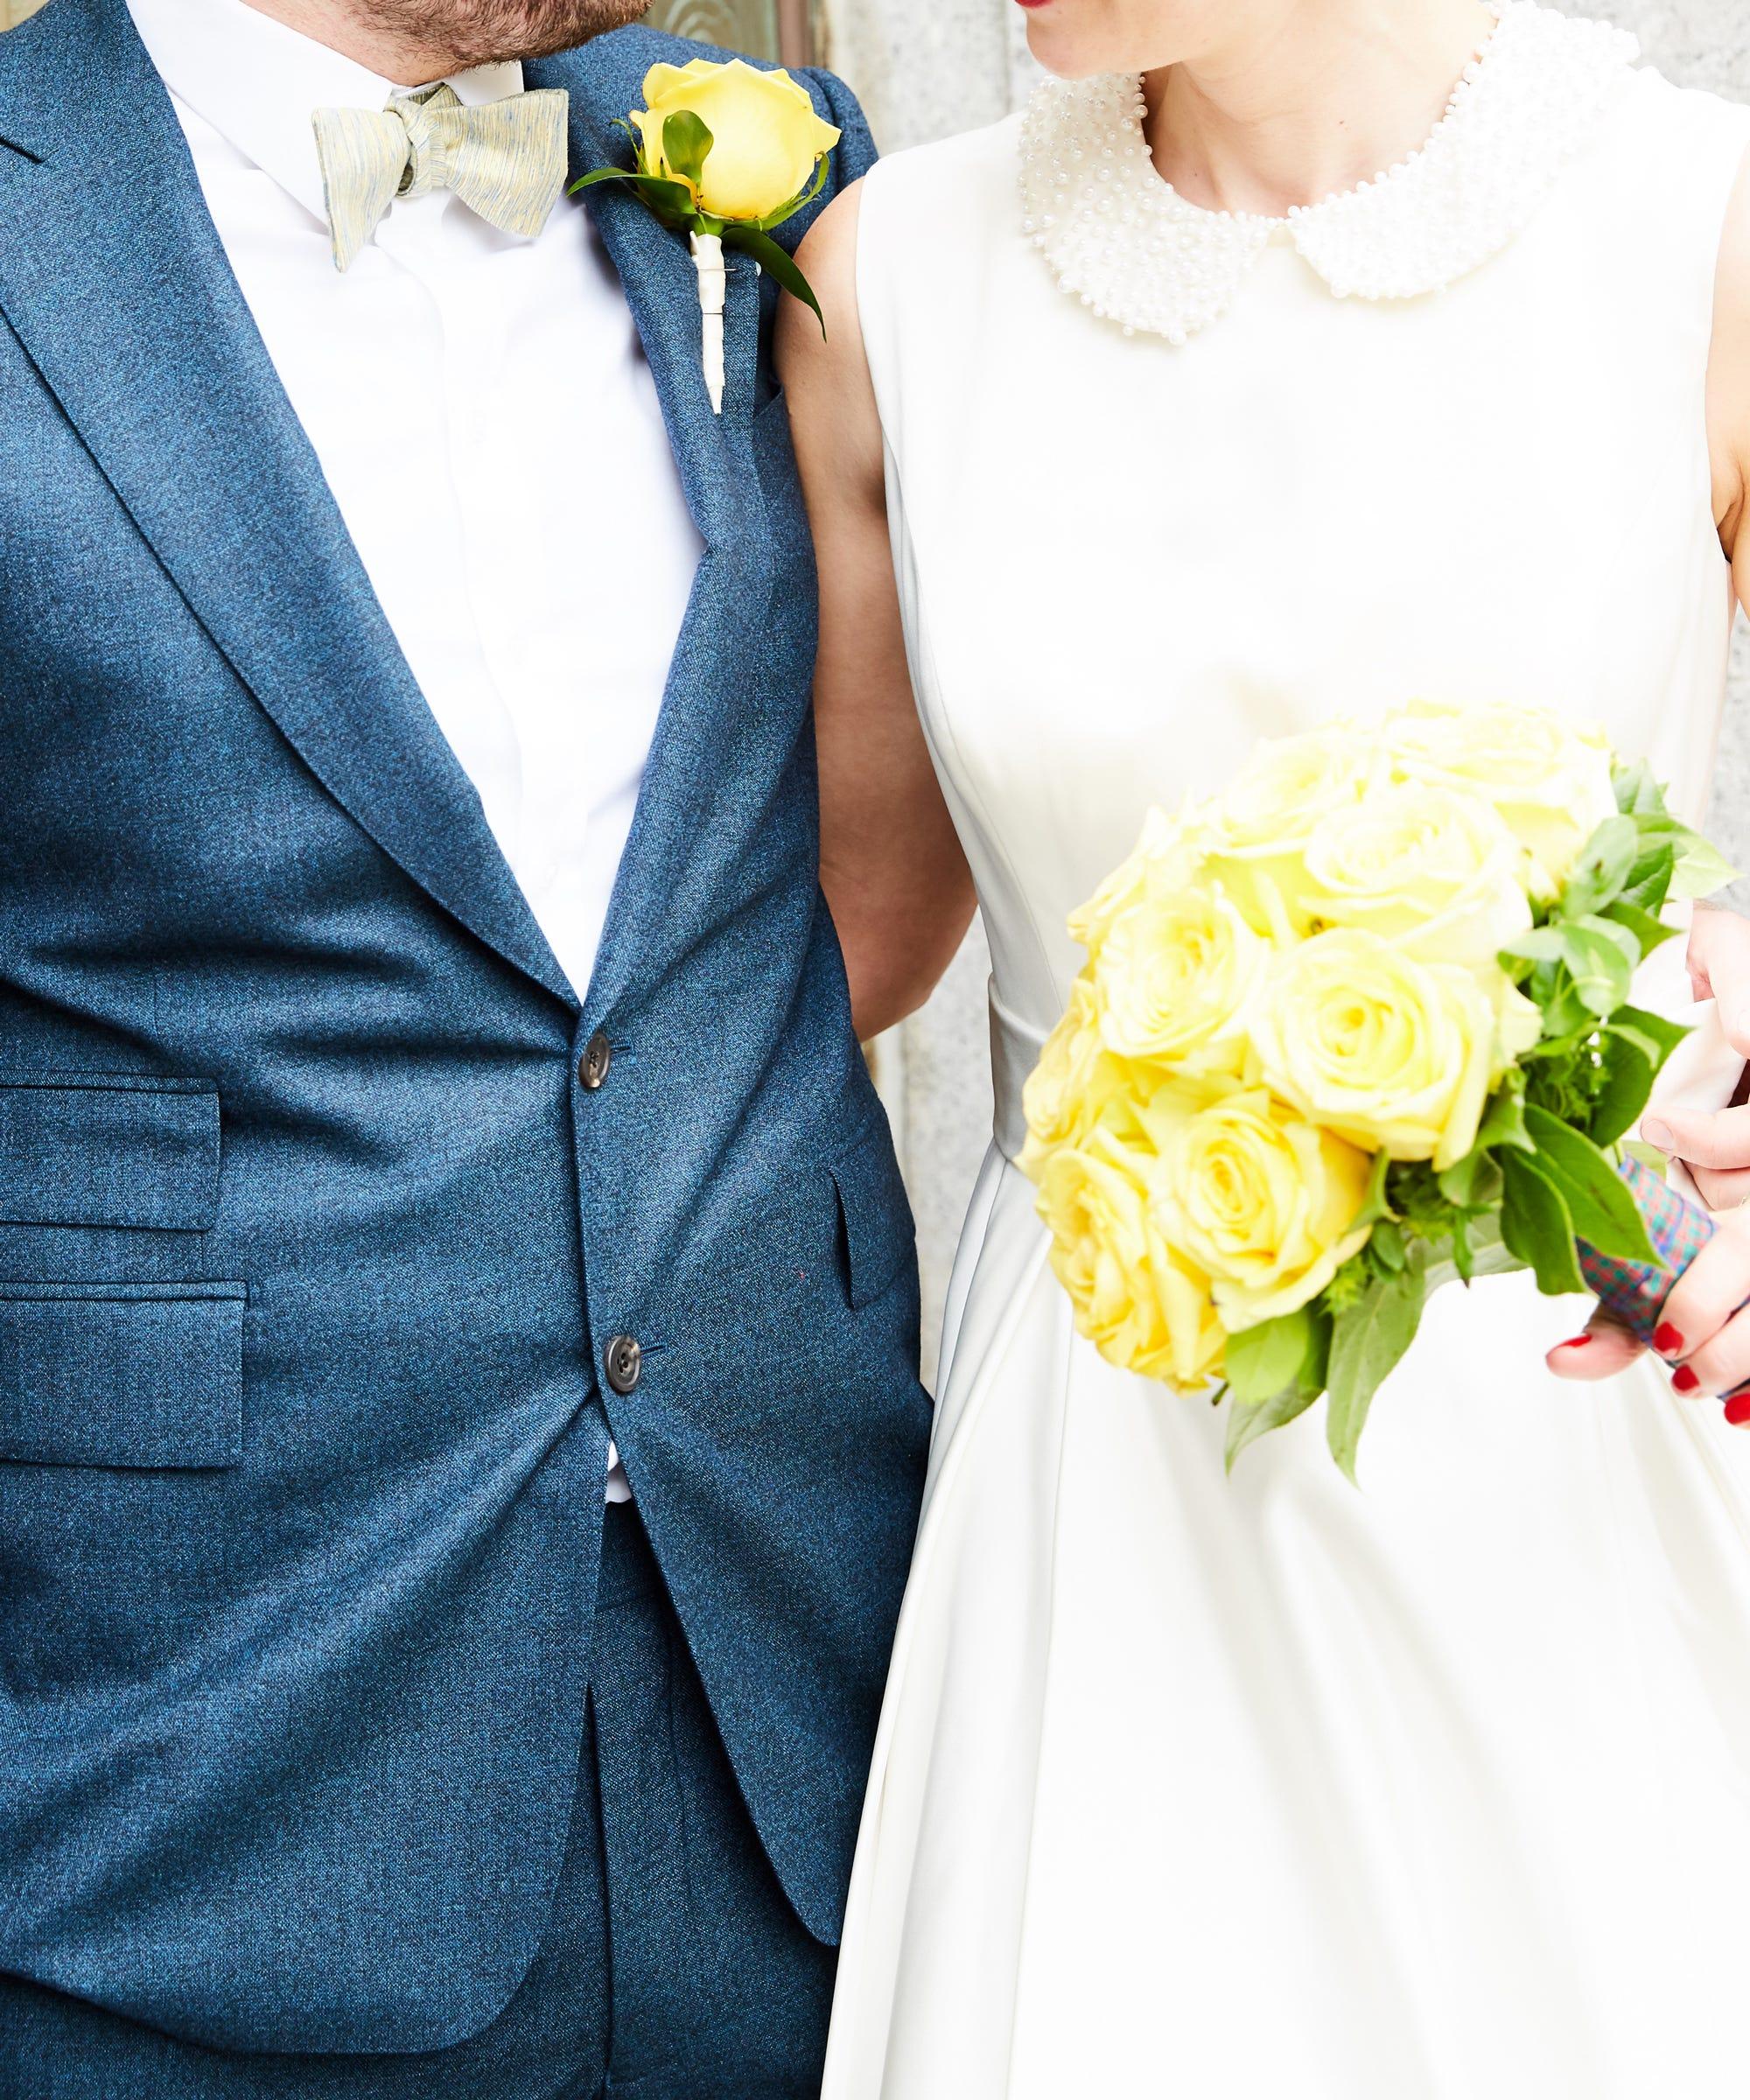 China Groom Wedding Dress Bride Tuxedo Swap Photos